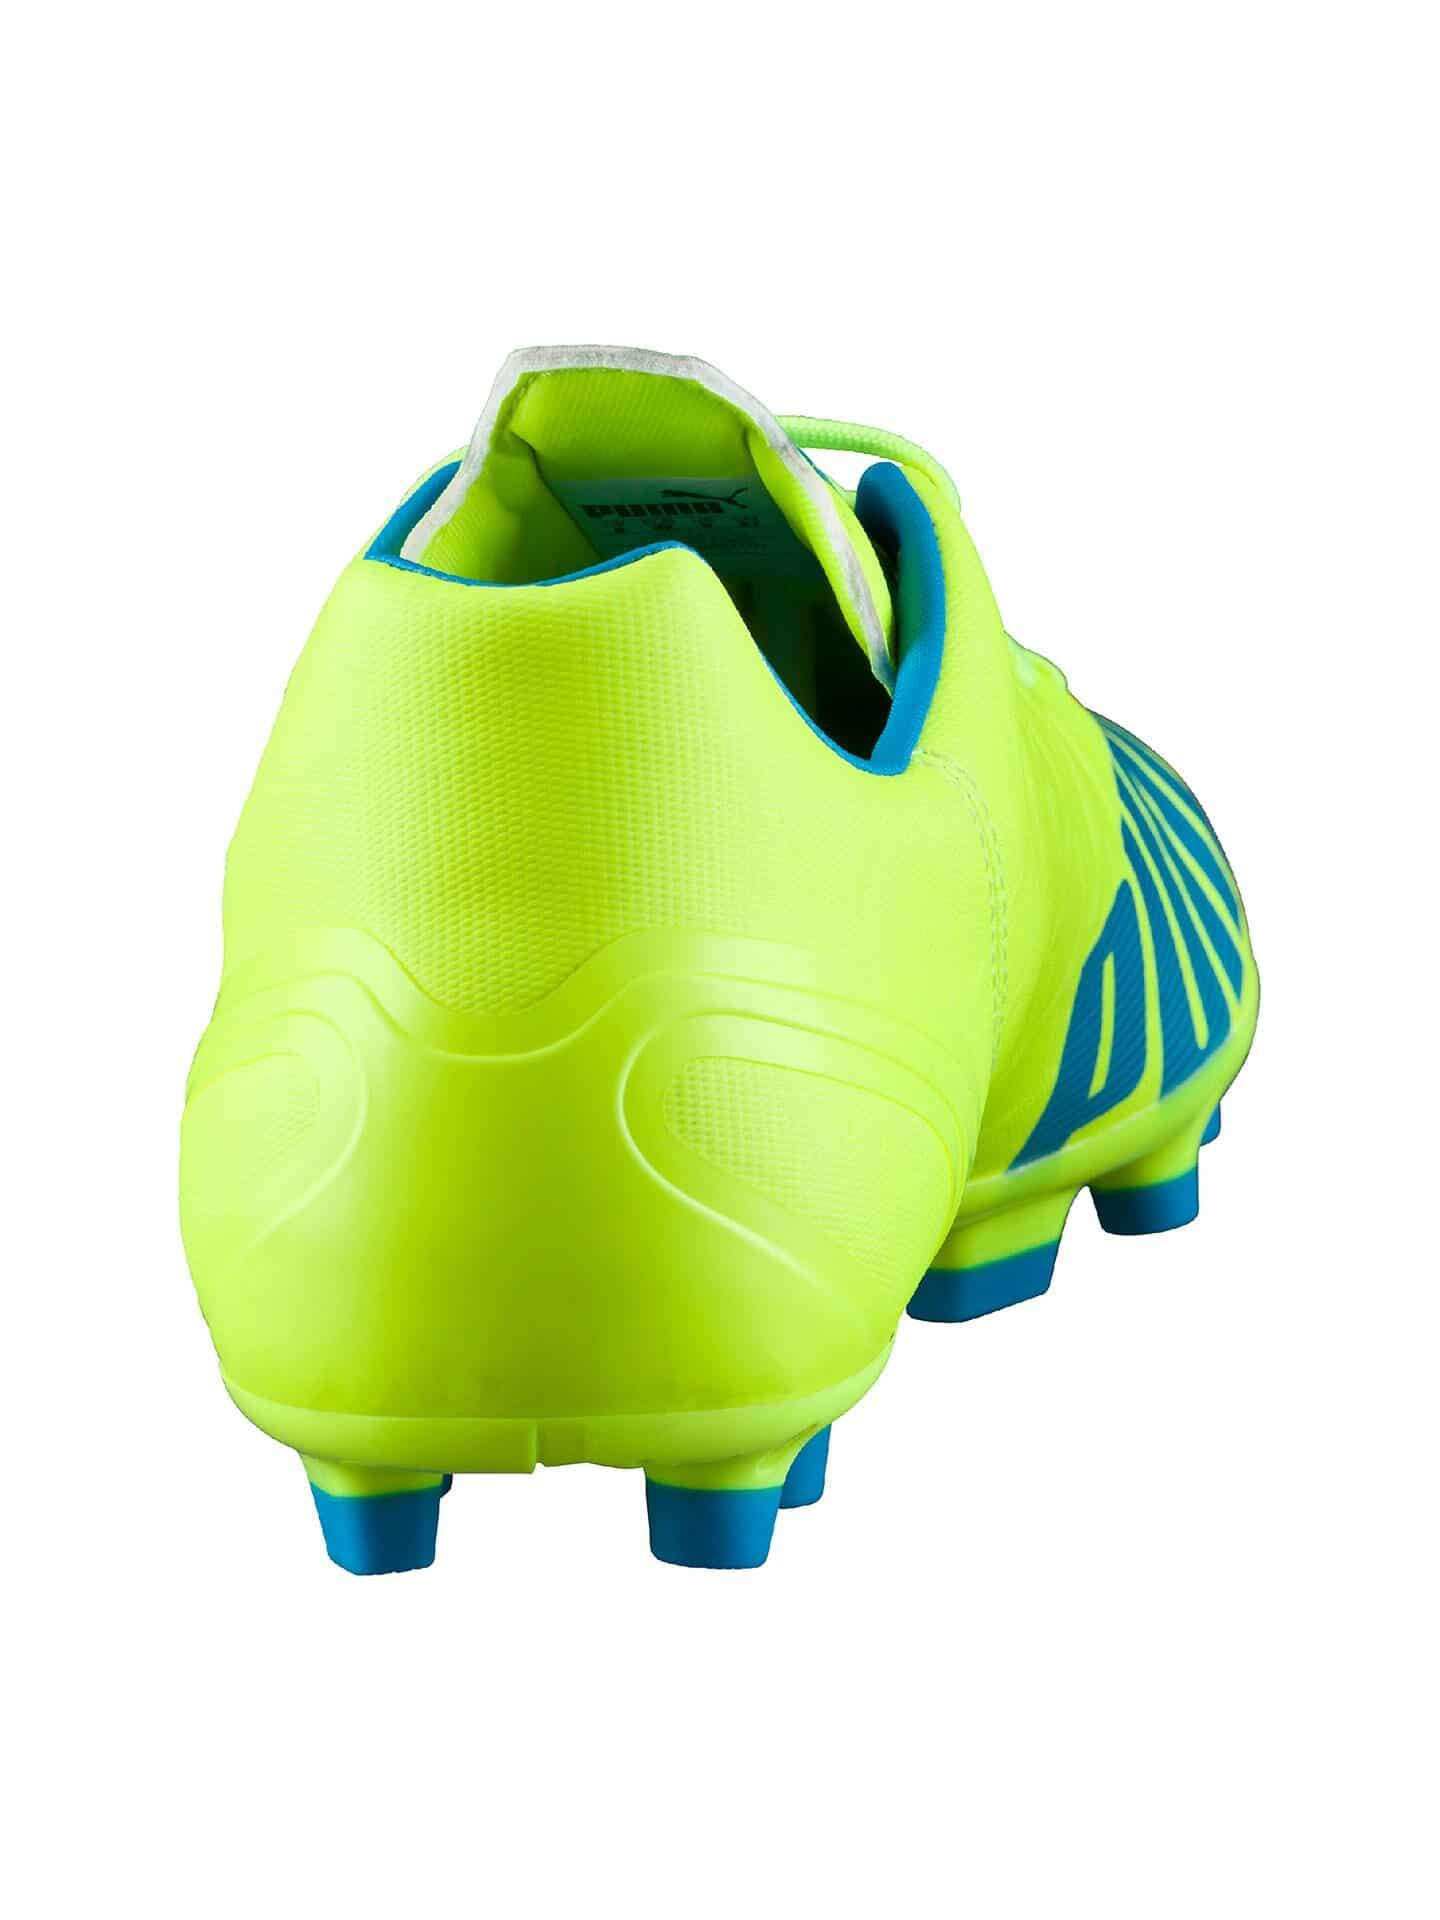 Giày đá bóng PUMA Evospeed 4.41